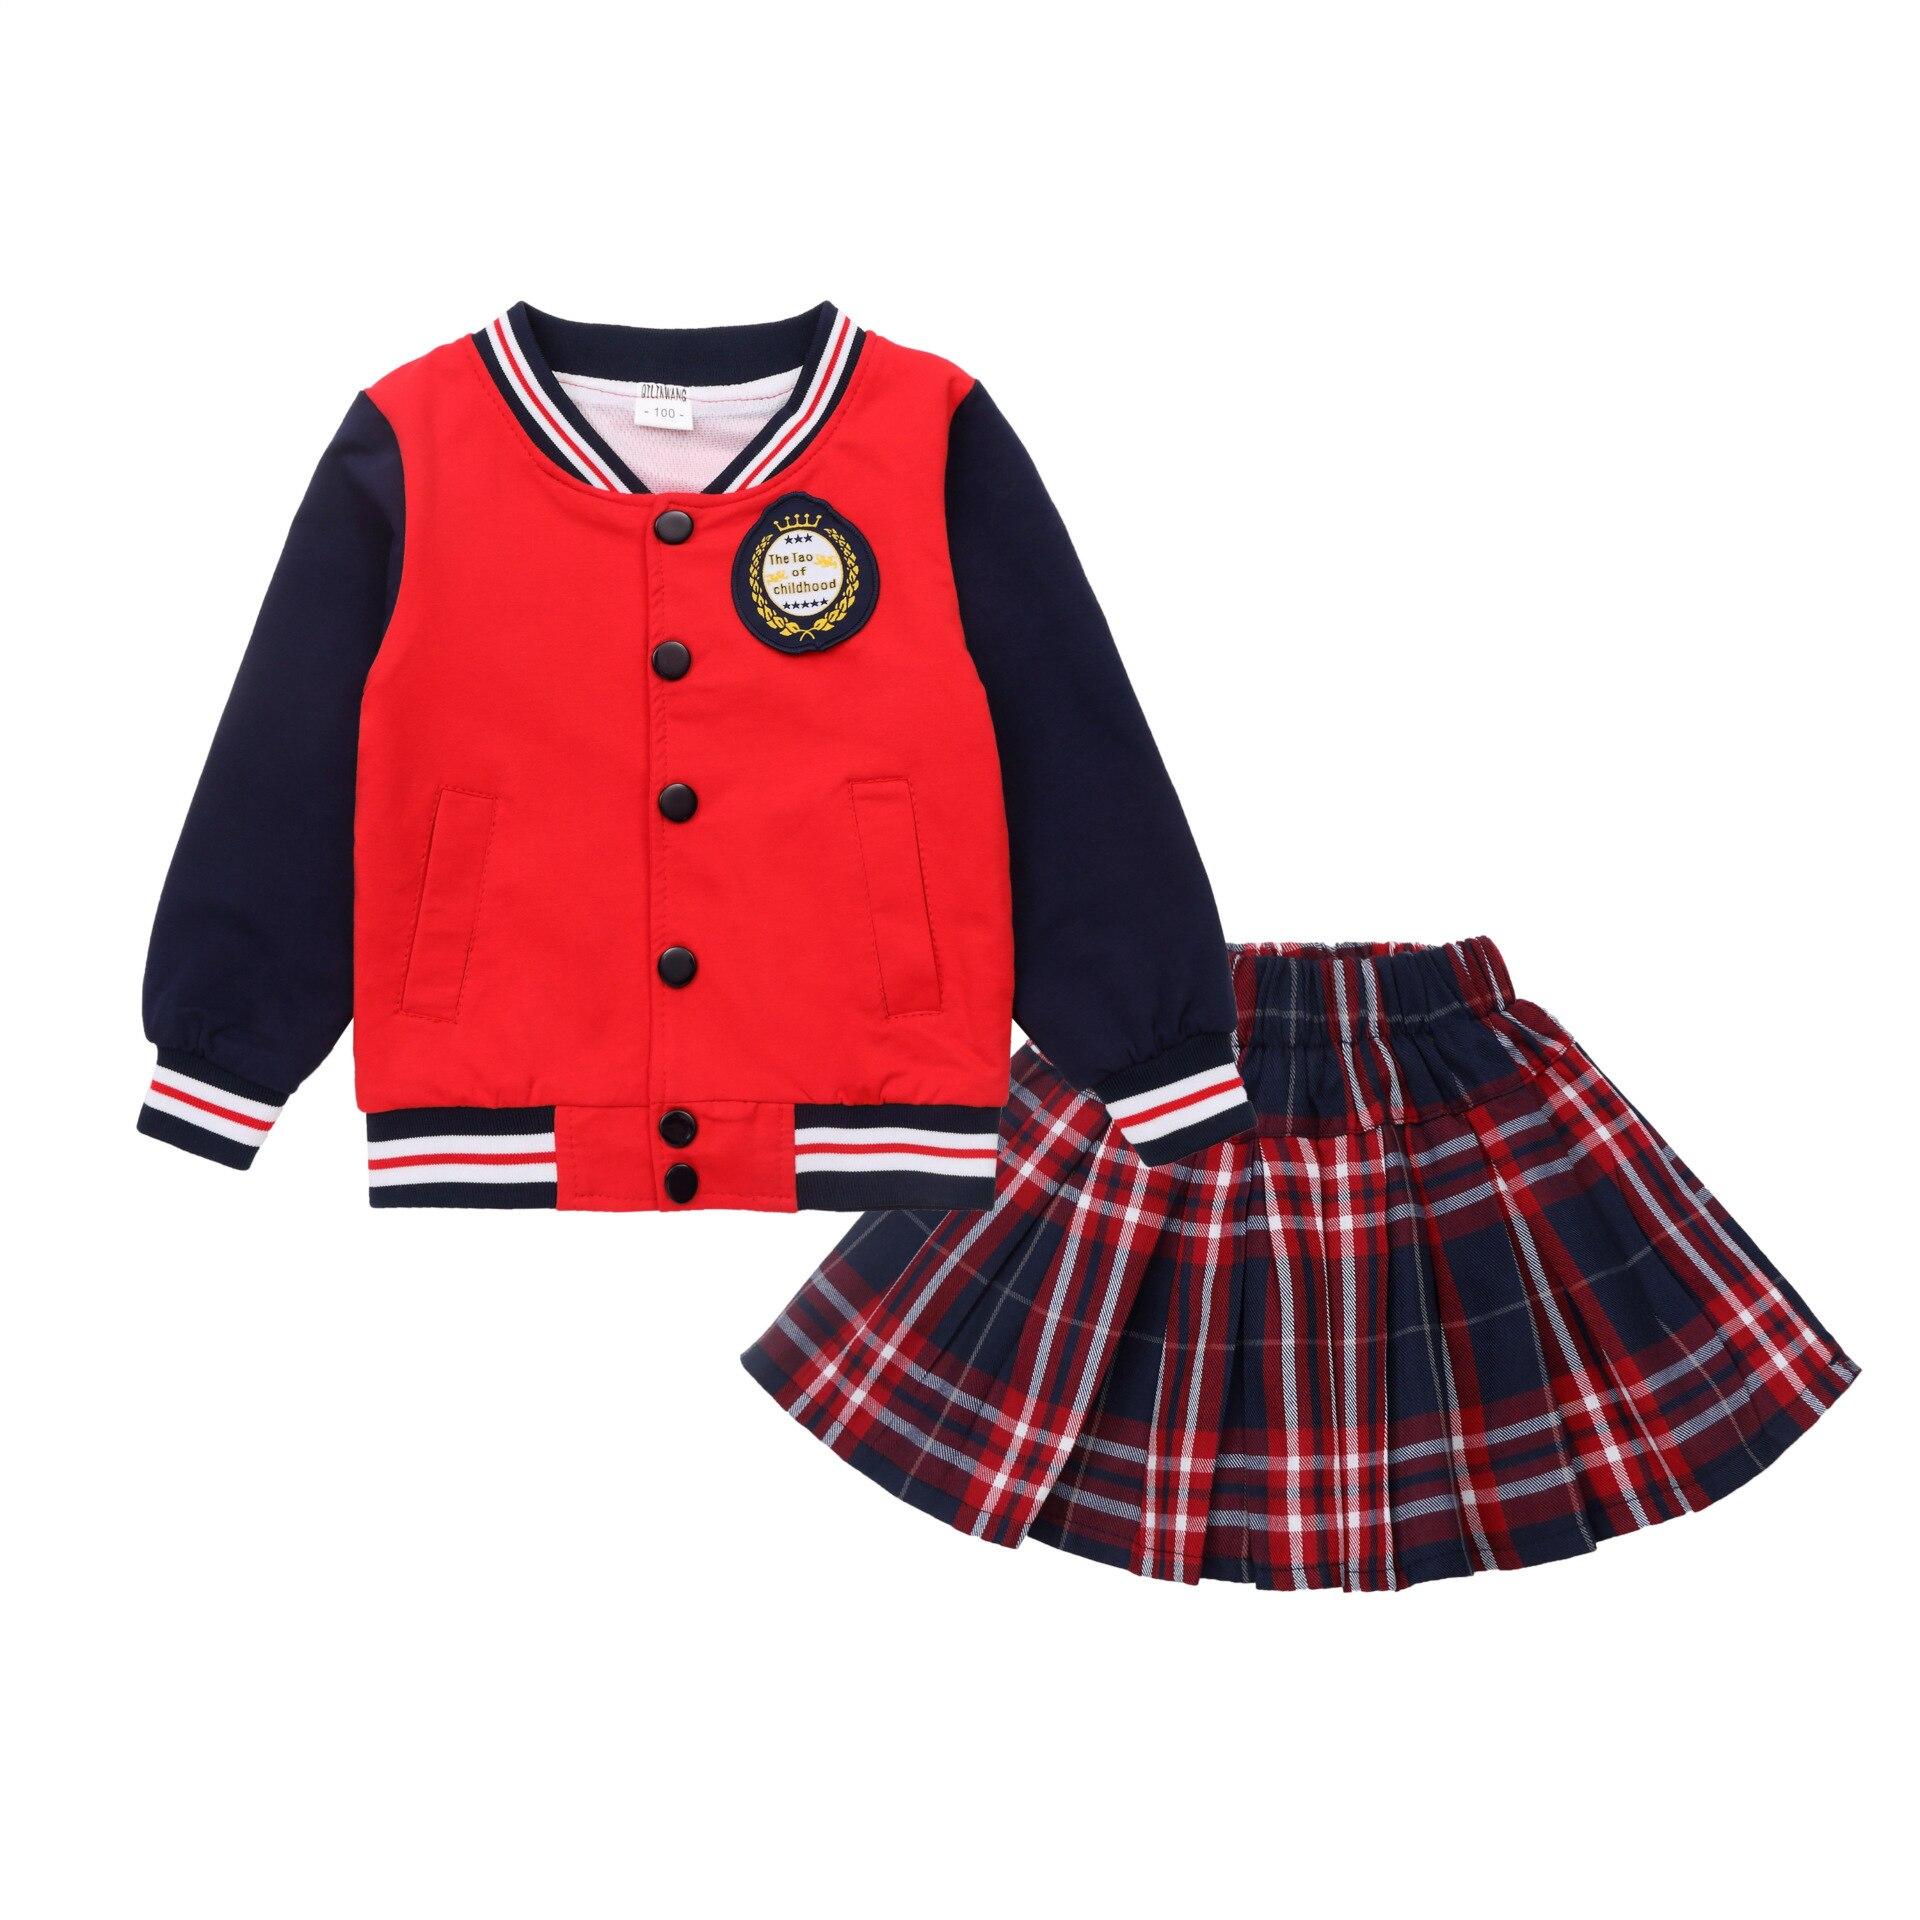 Kindergarten Suit 2018 Spring And Autumn College Style School Uniform Children British Style Set Young STUDENT'S Business Attire